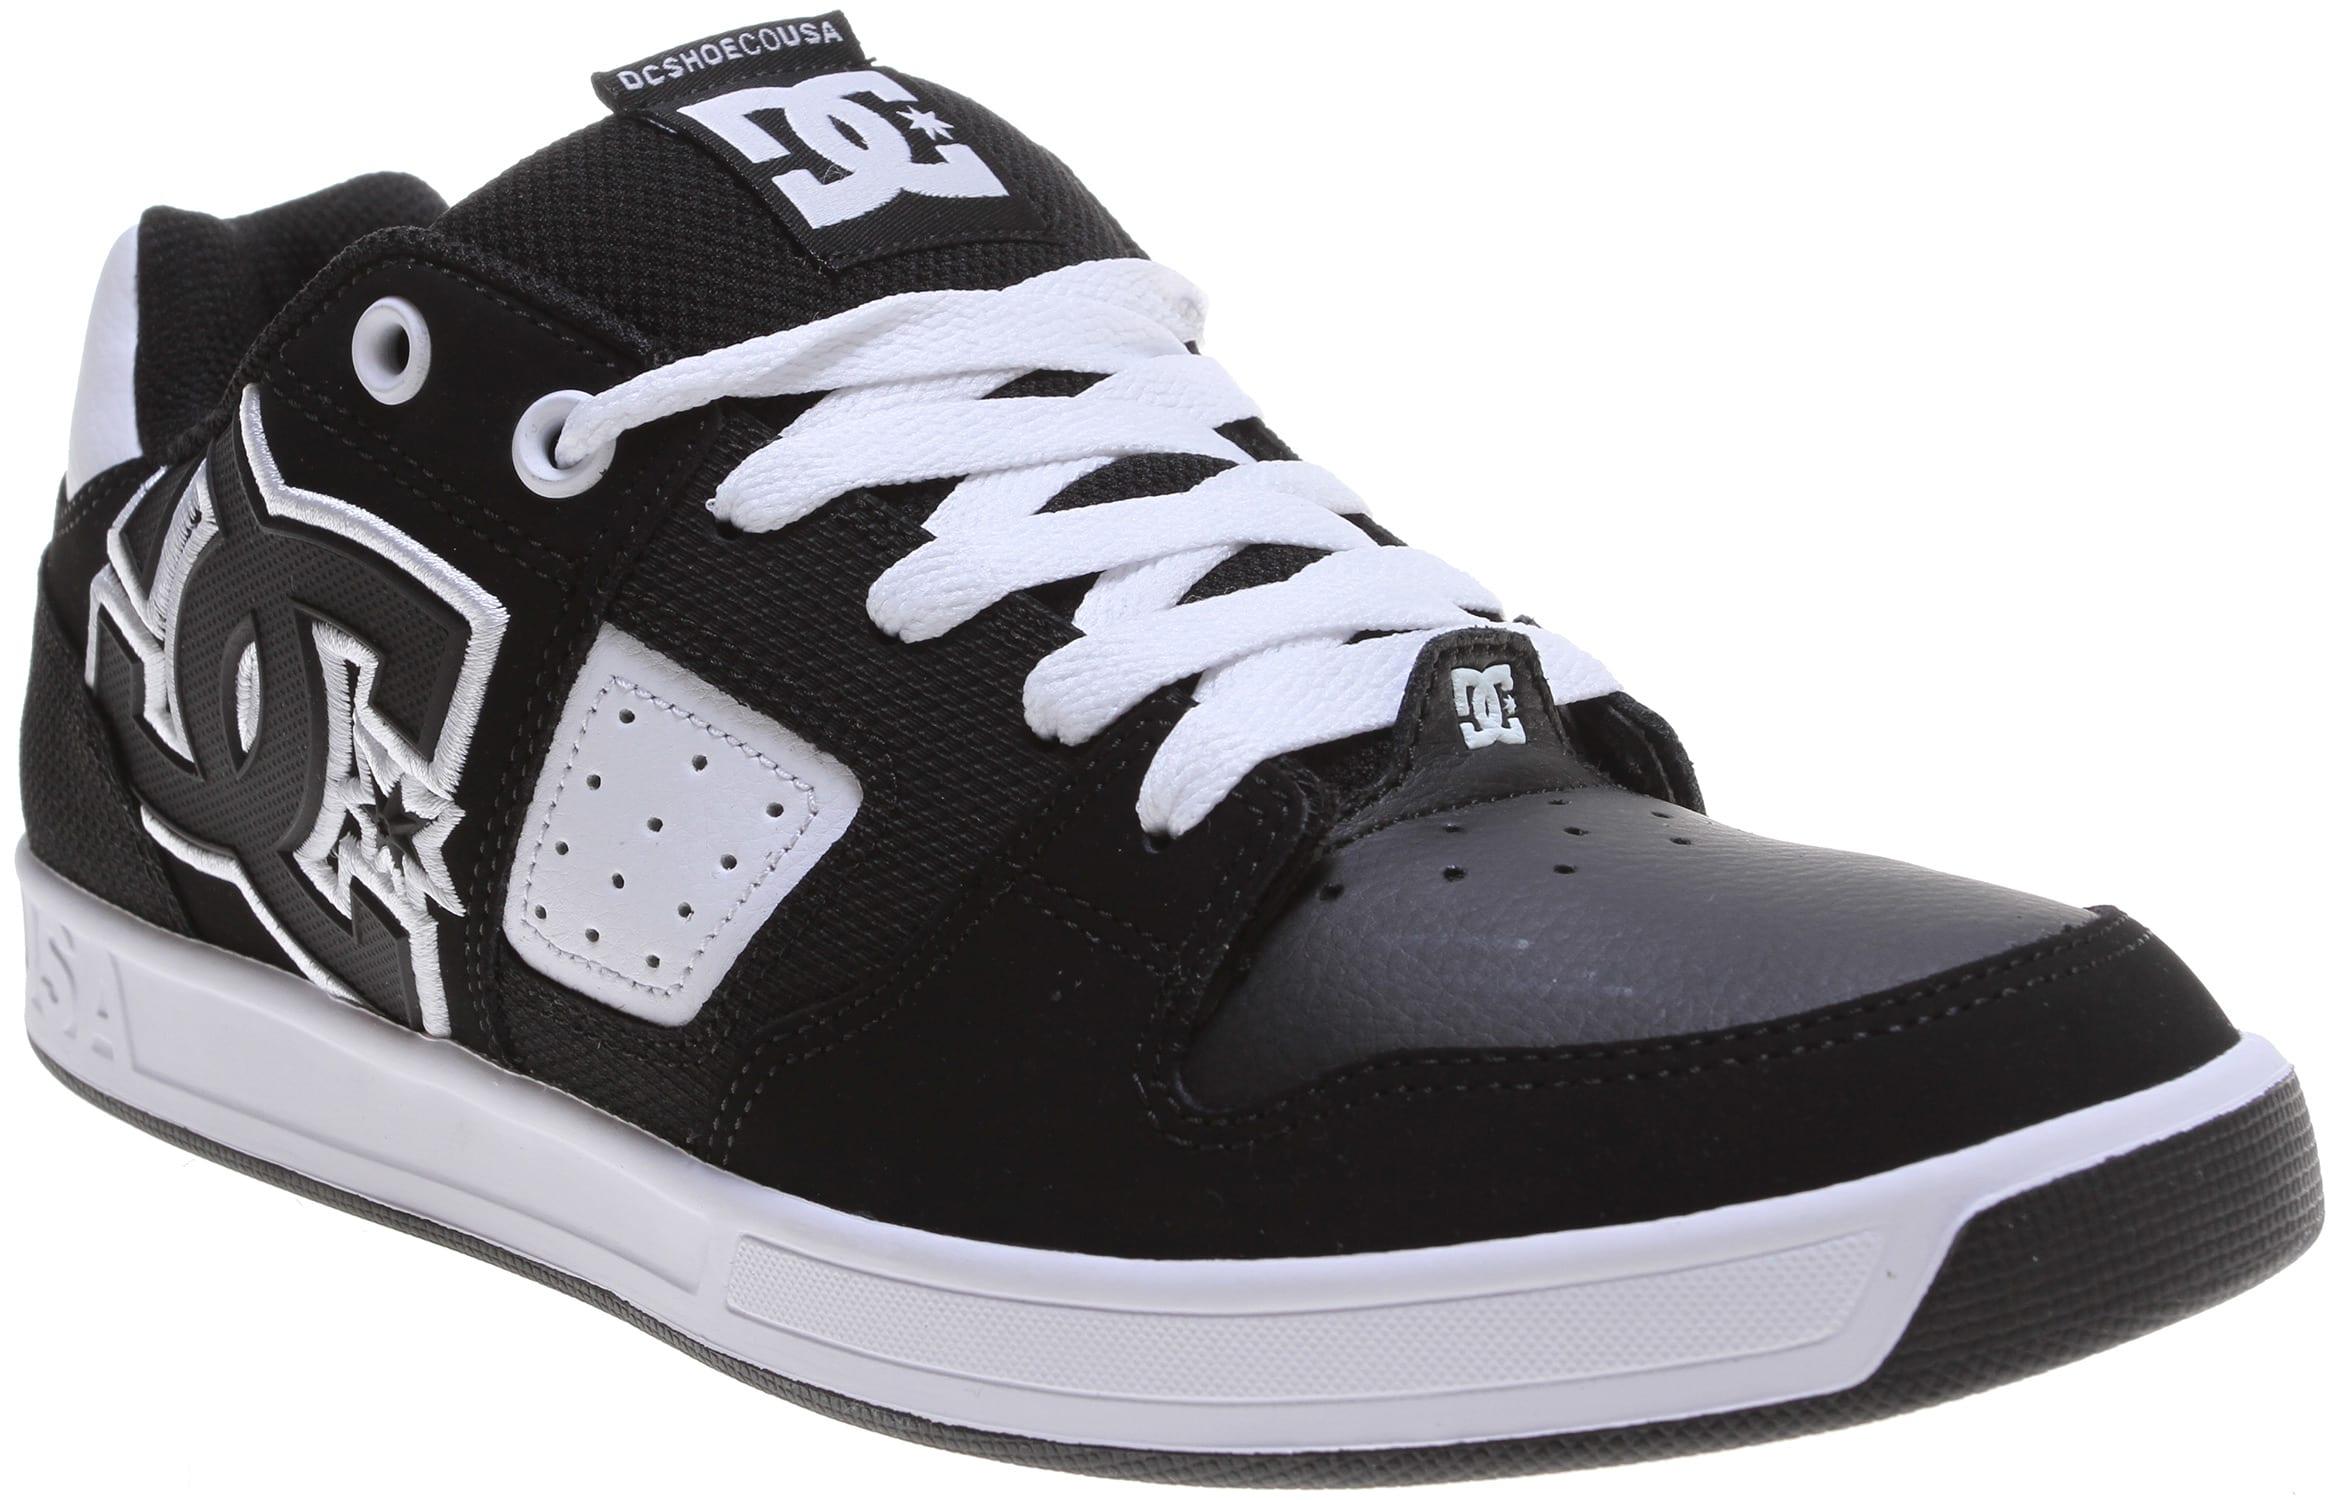 Skate shoes dc - Dc Sceptor Skate Shoes